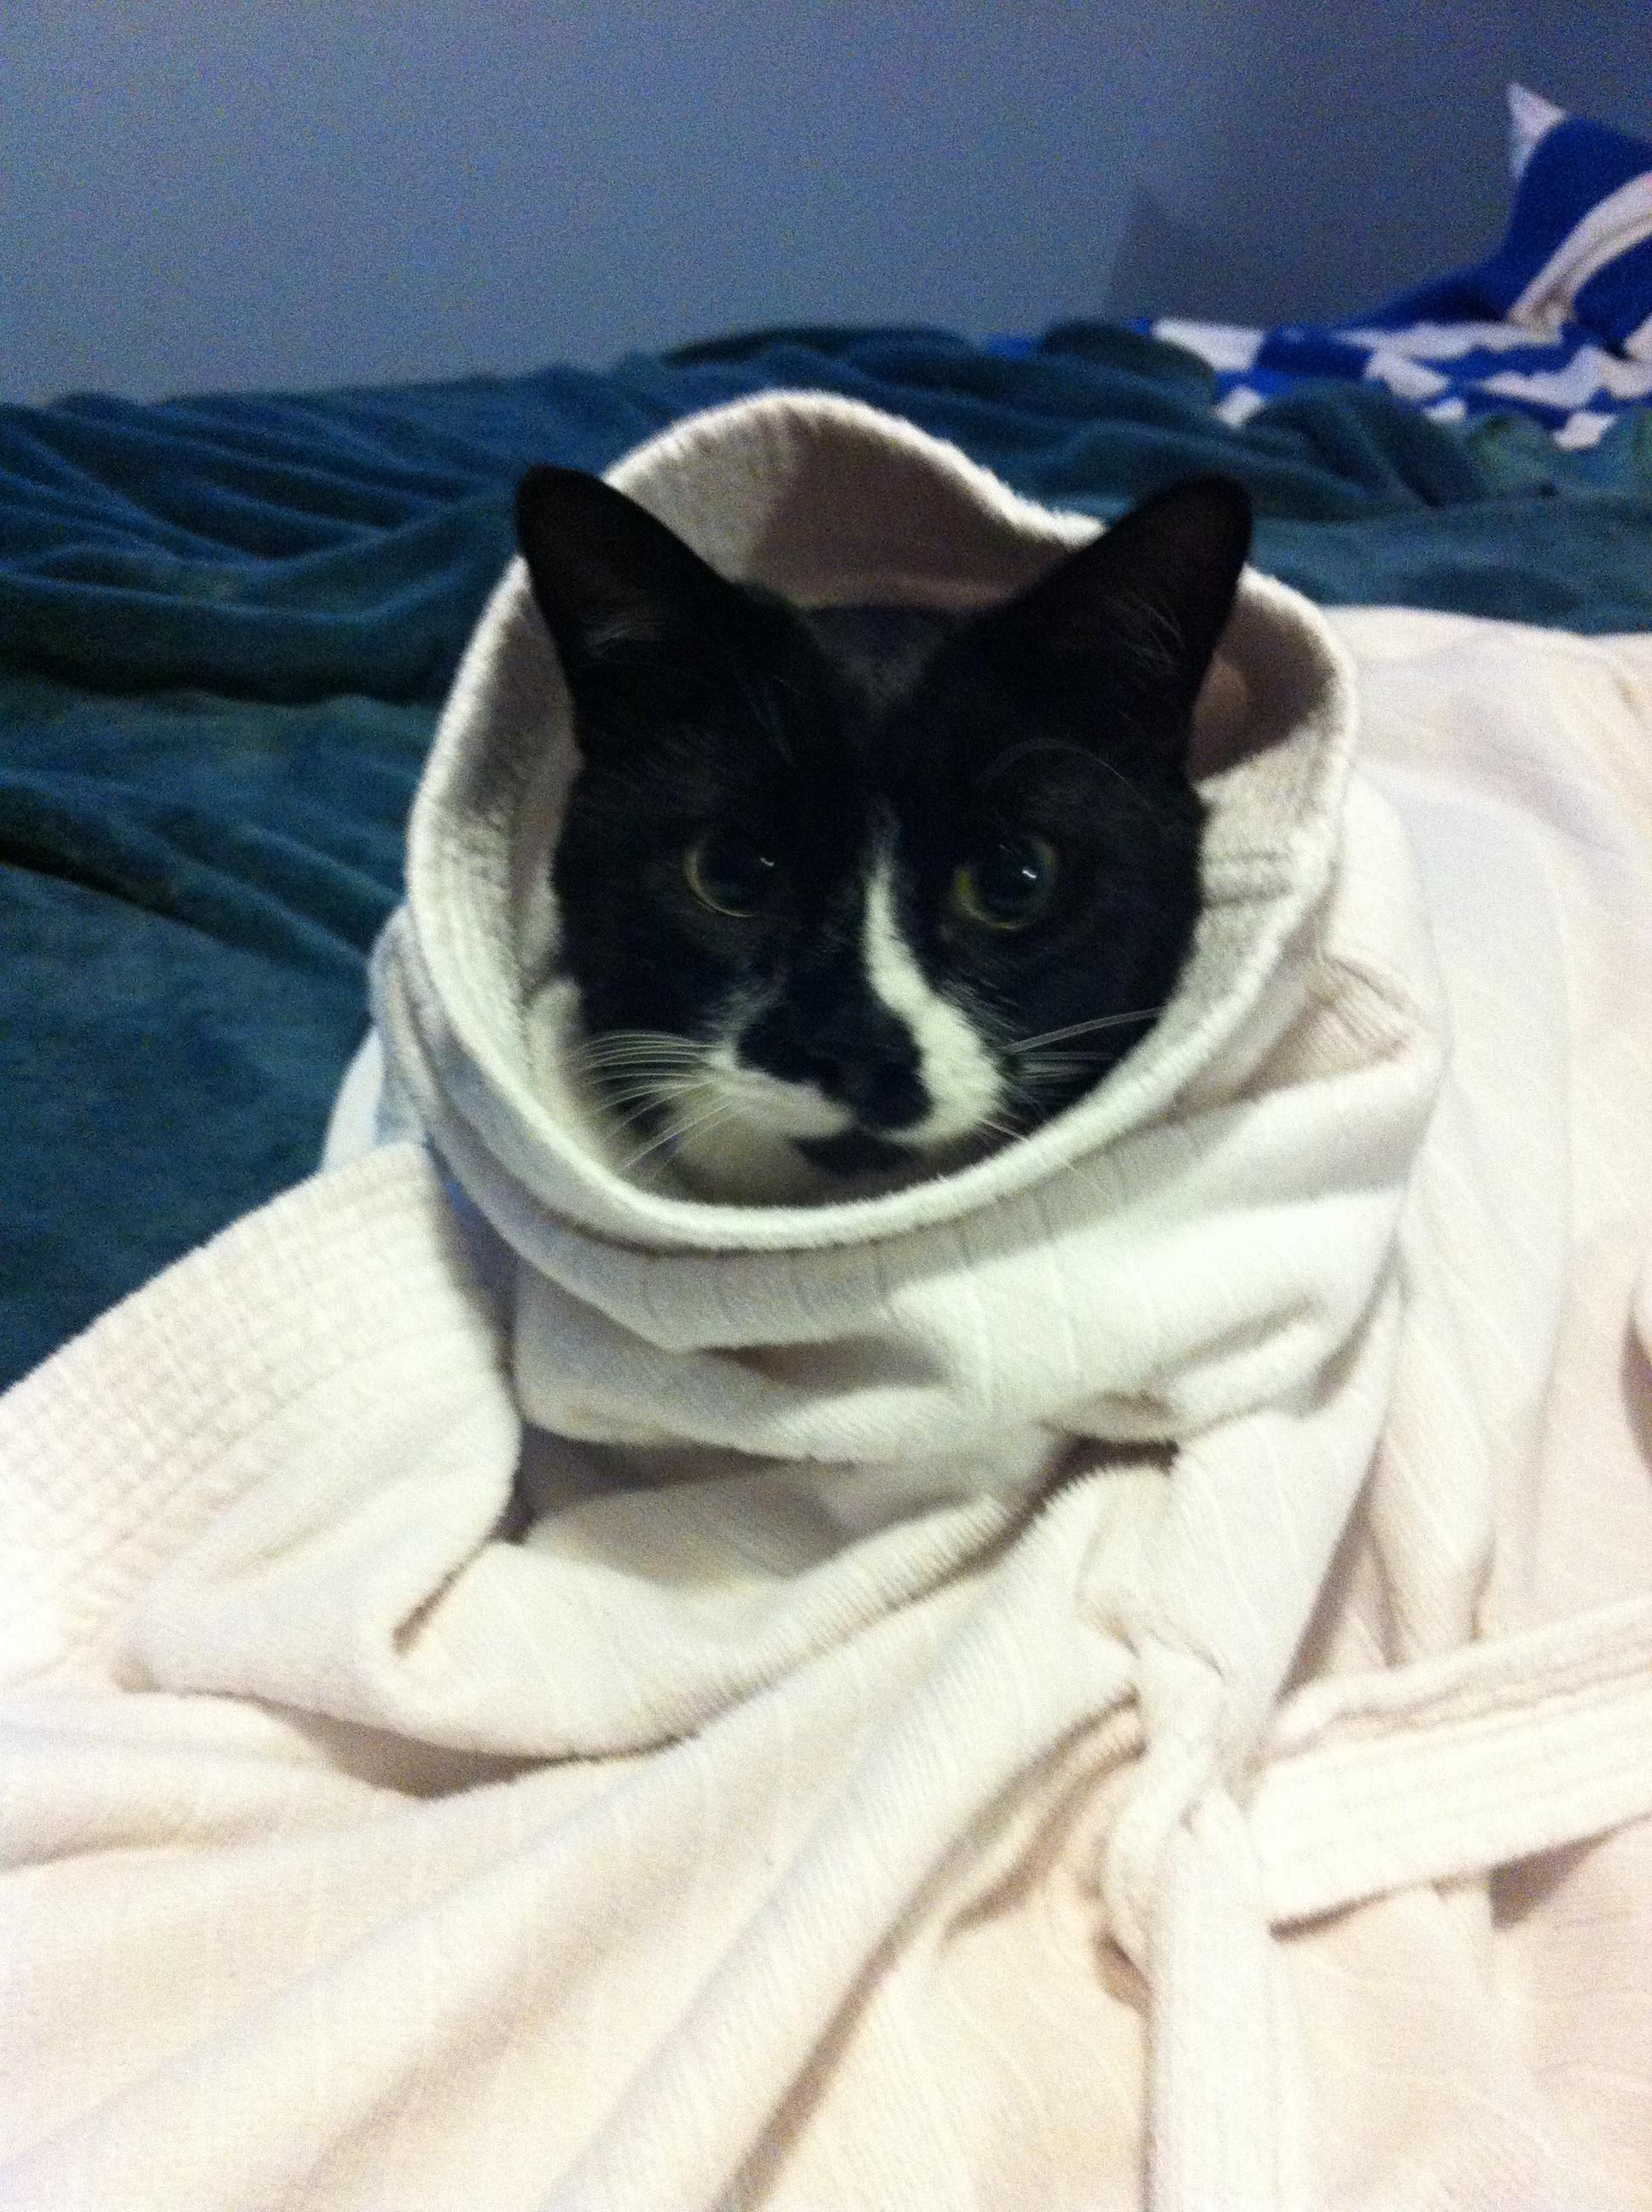 tippy in my robe